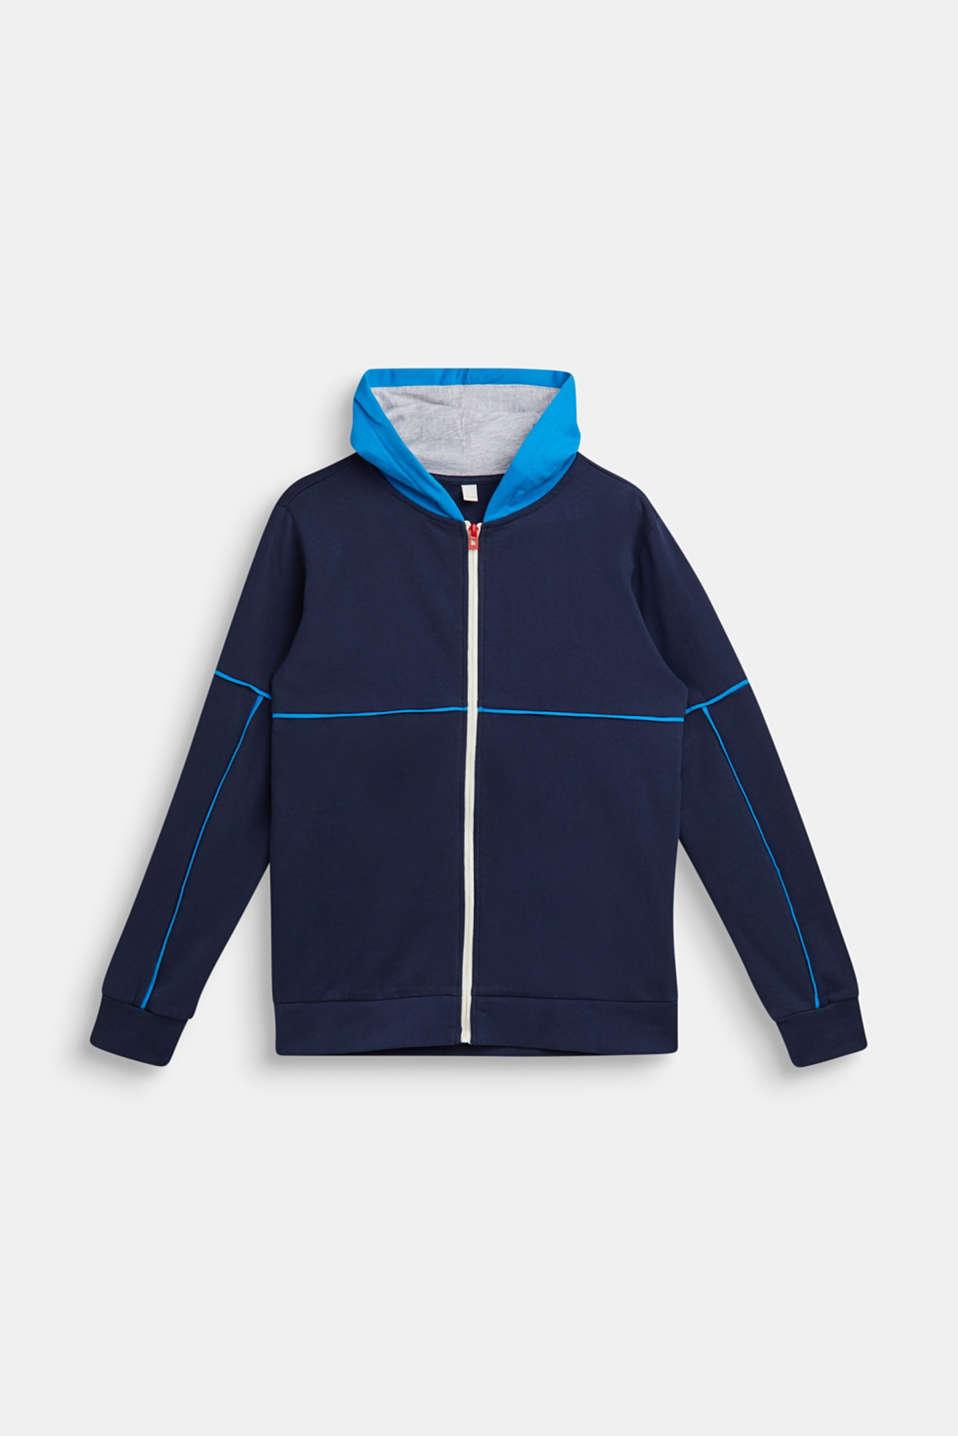 Sweatshirt cardigan with hood and print, LCNAVY, detail image number 0